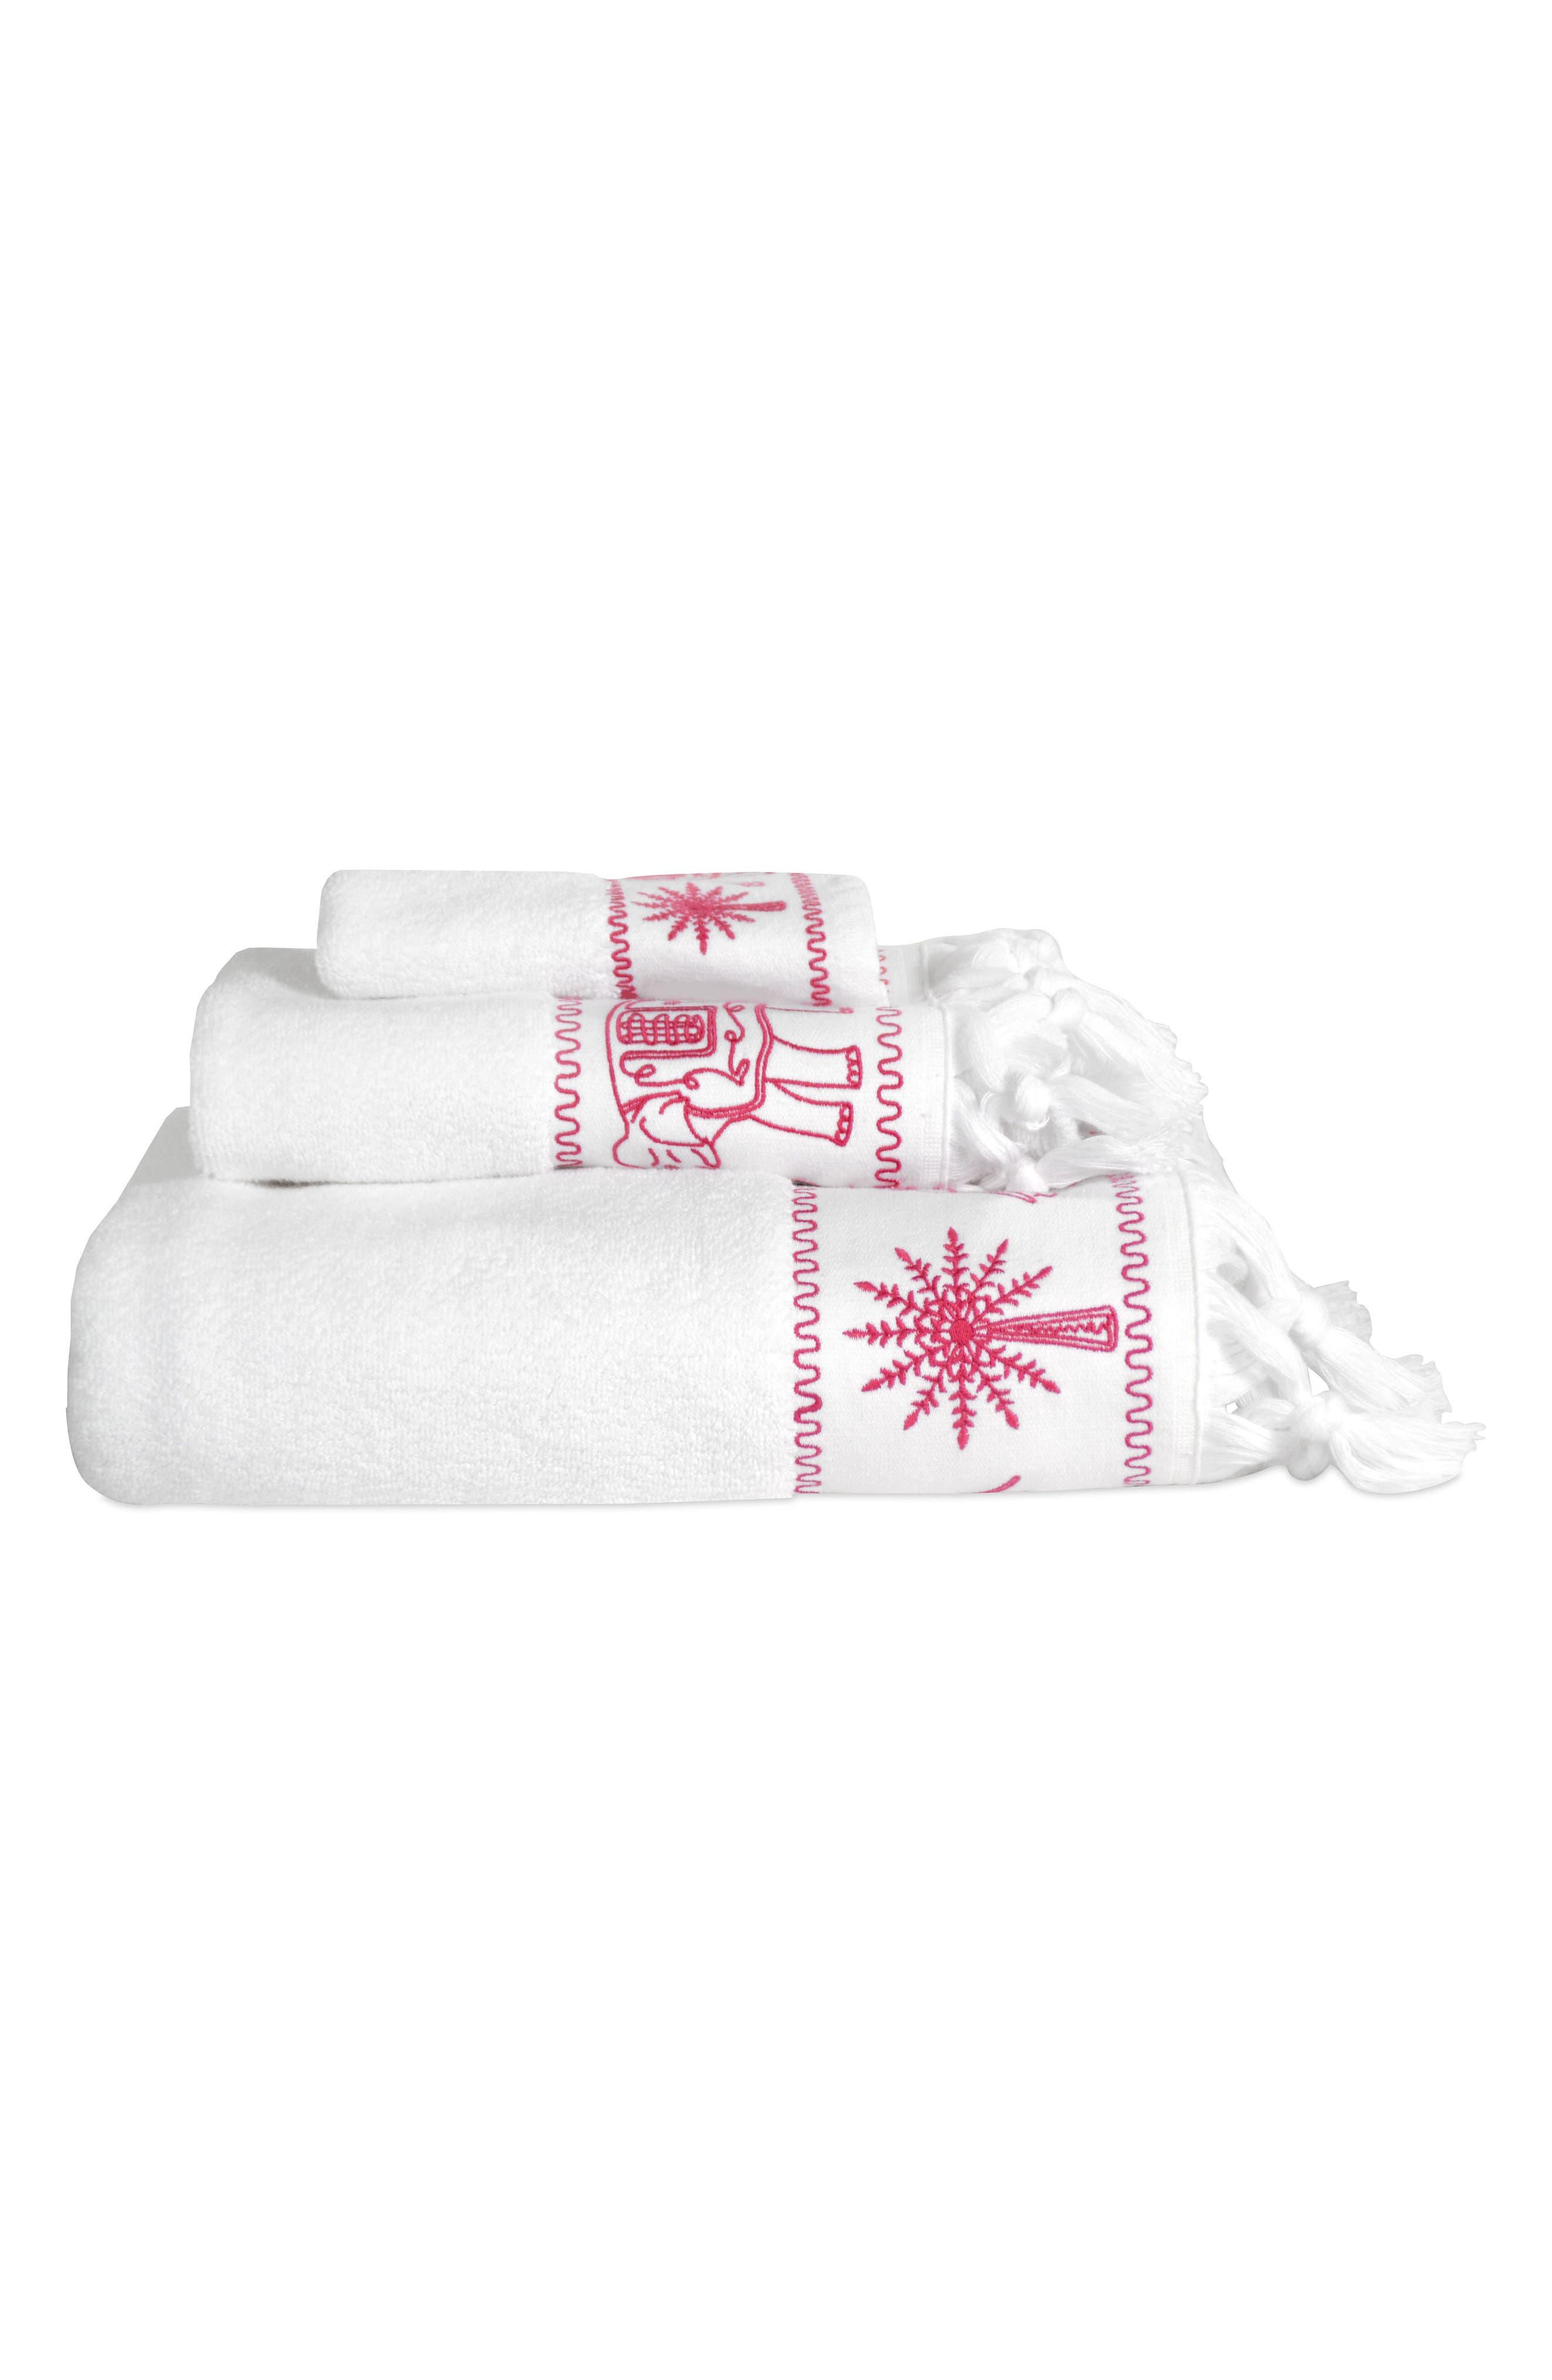 Alternate Image 2  - John Robshaw Yaji Fringed Hand Towel